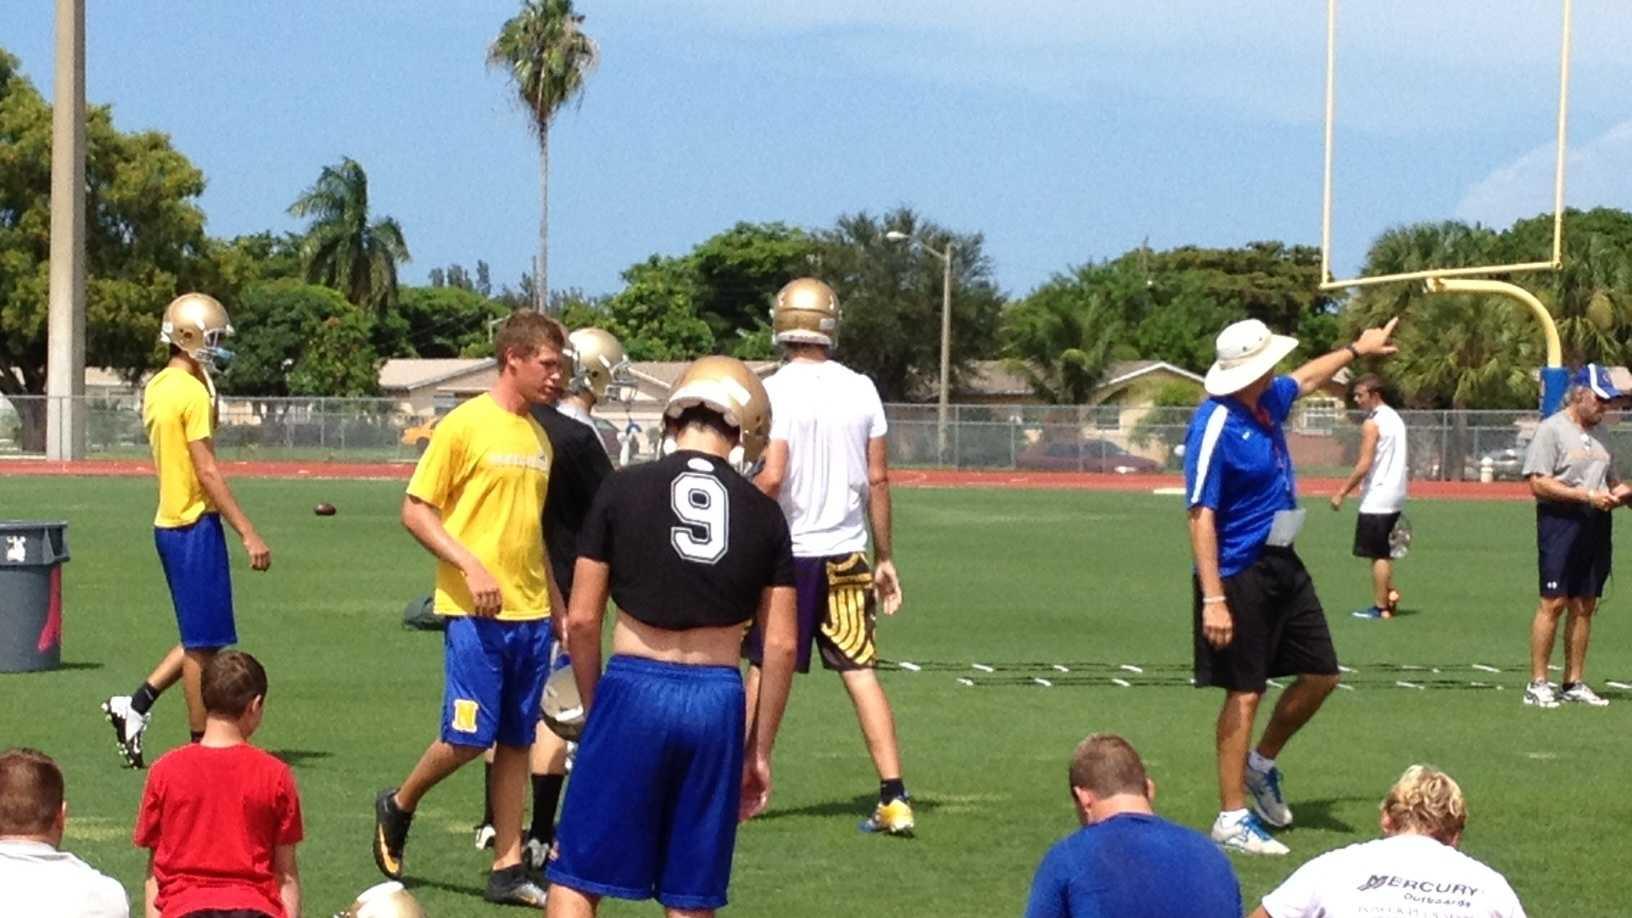 High school football players practice